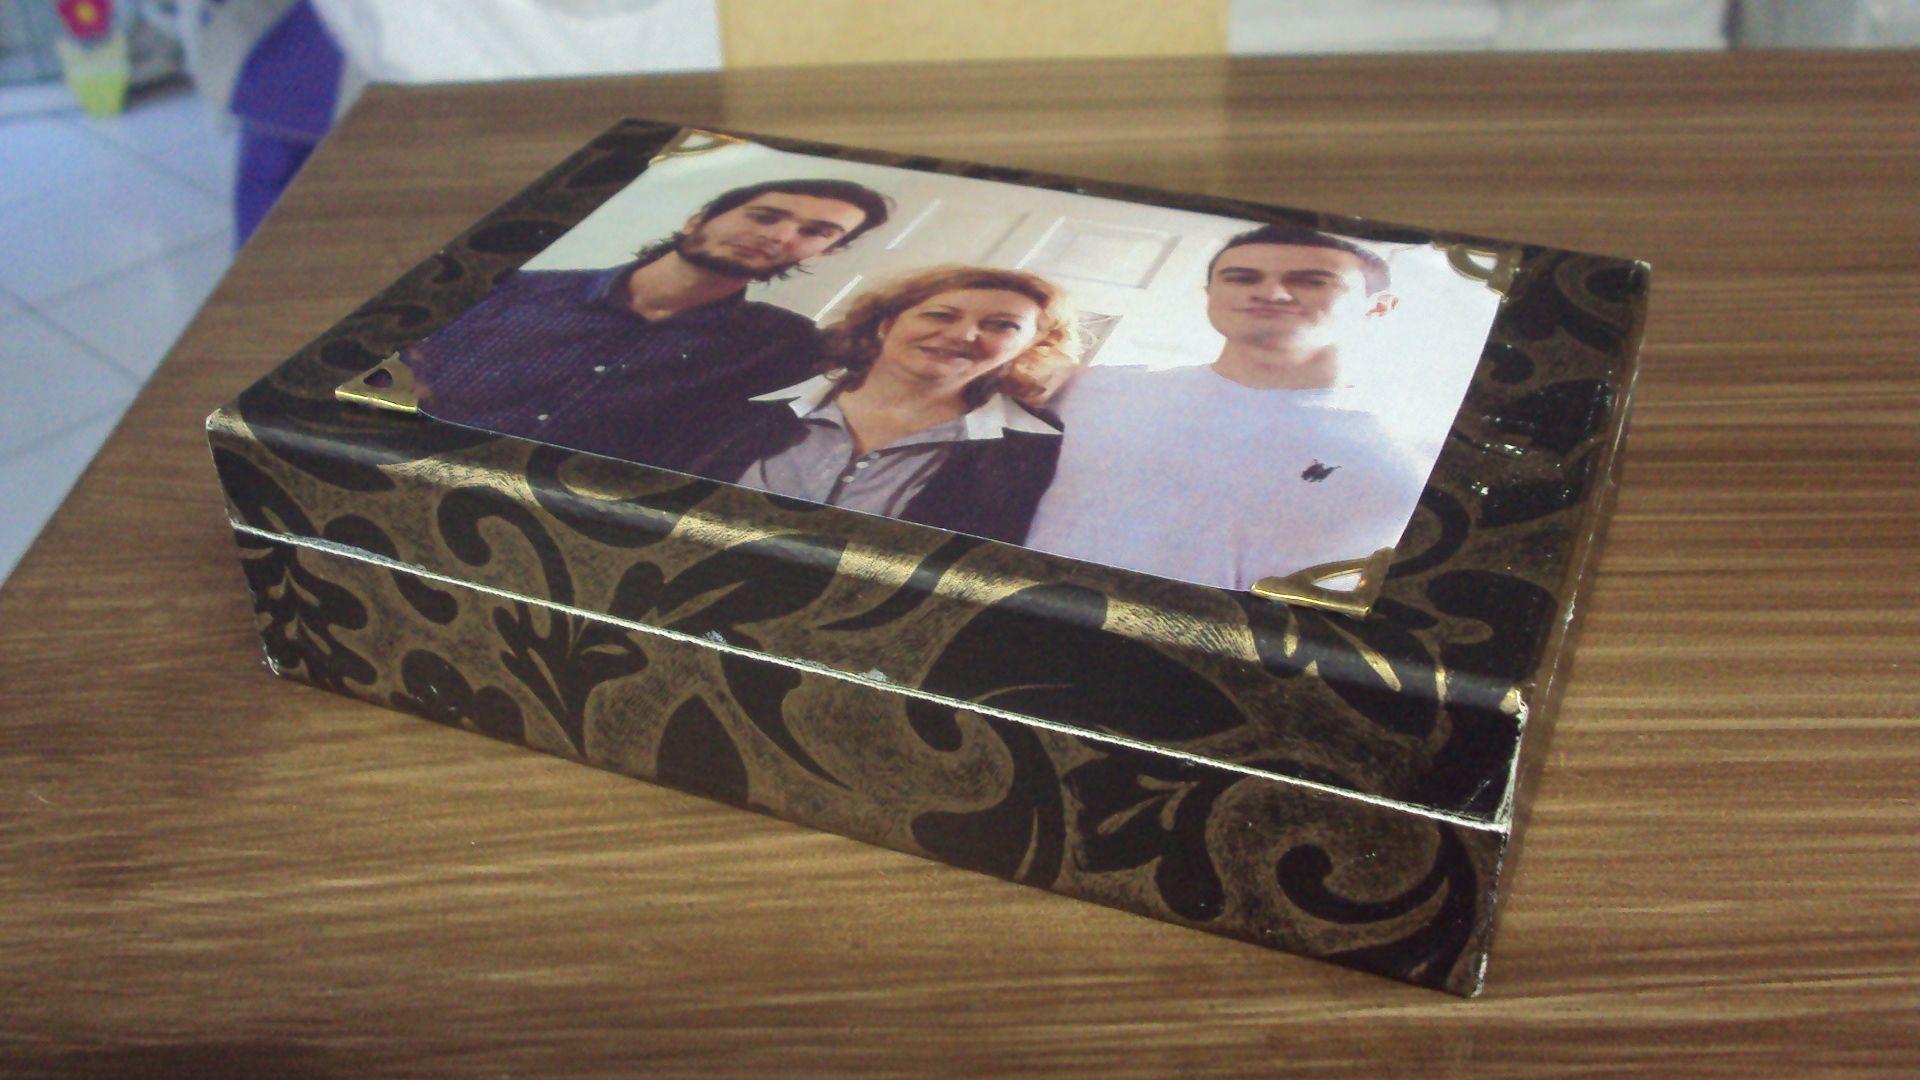 Caixa personalizada - aluna Ione